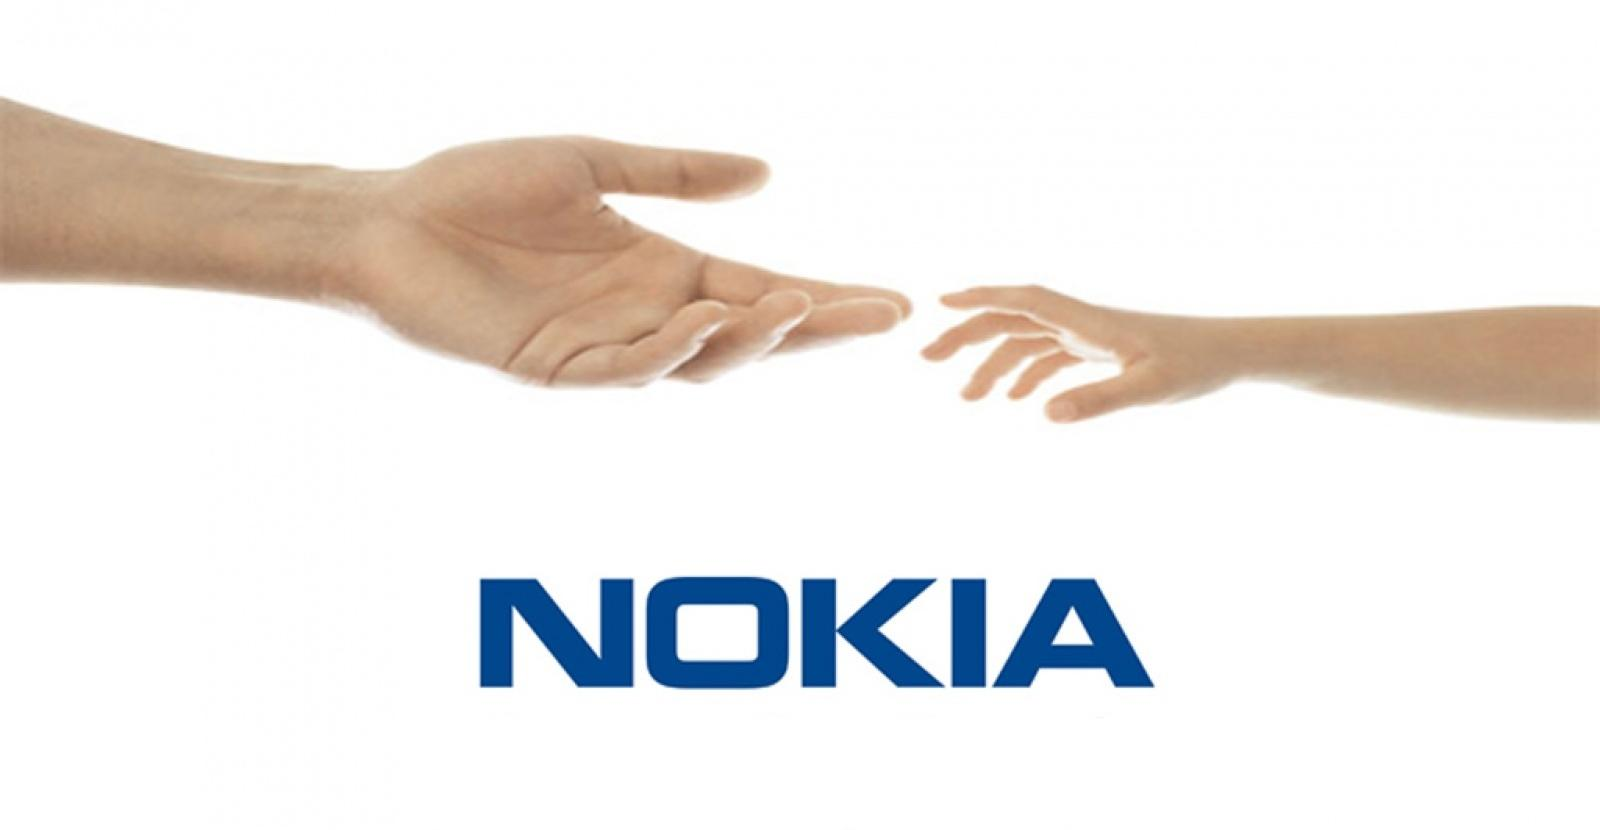 Image of Nokia customer care